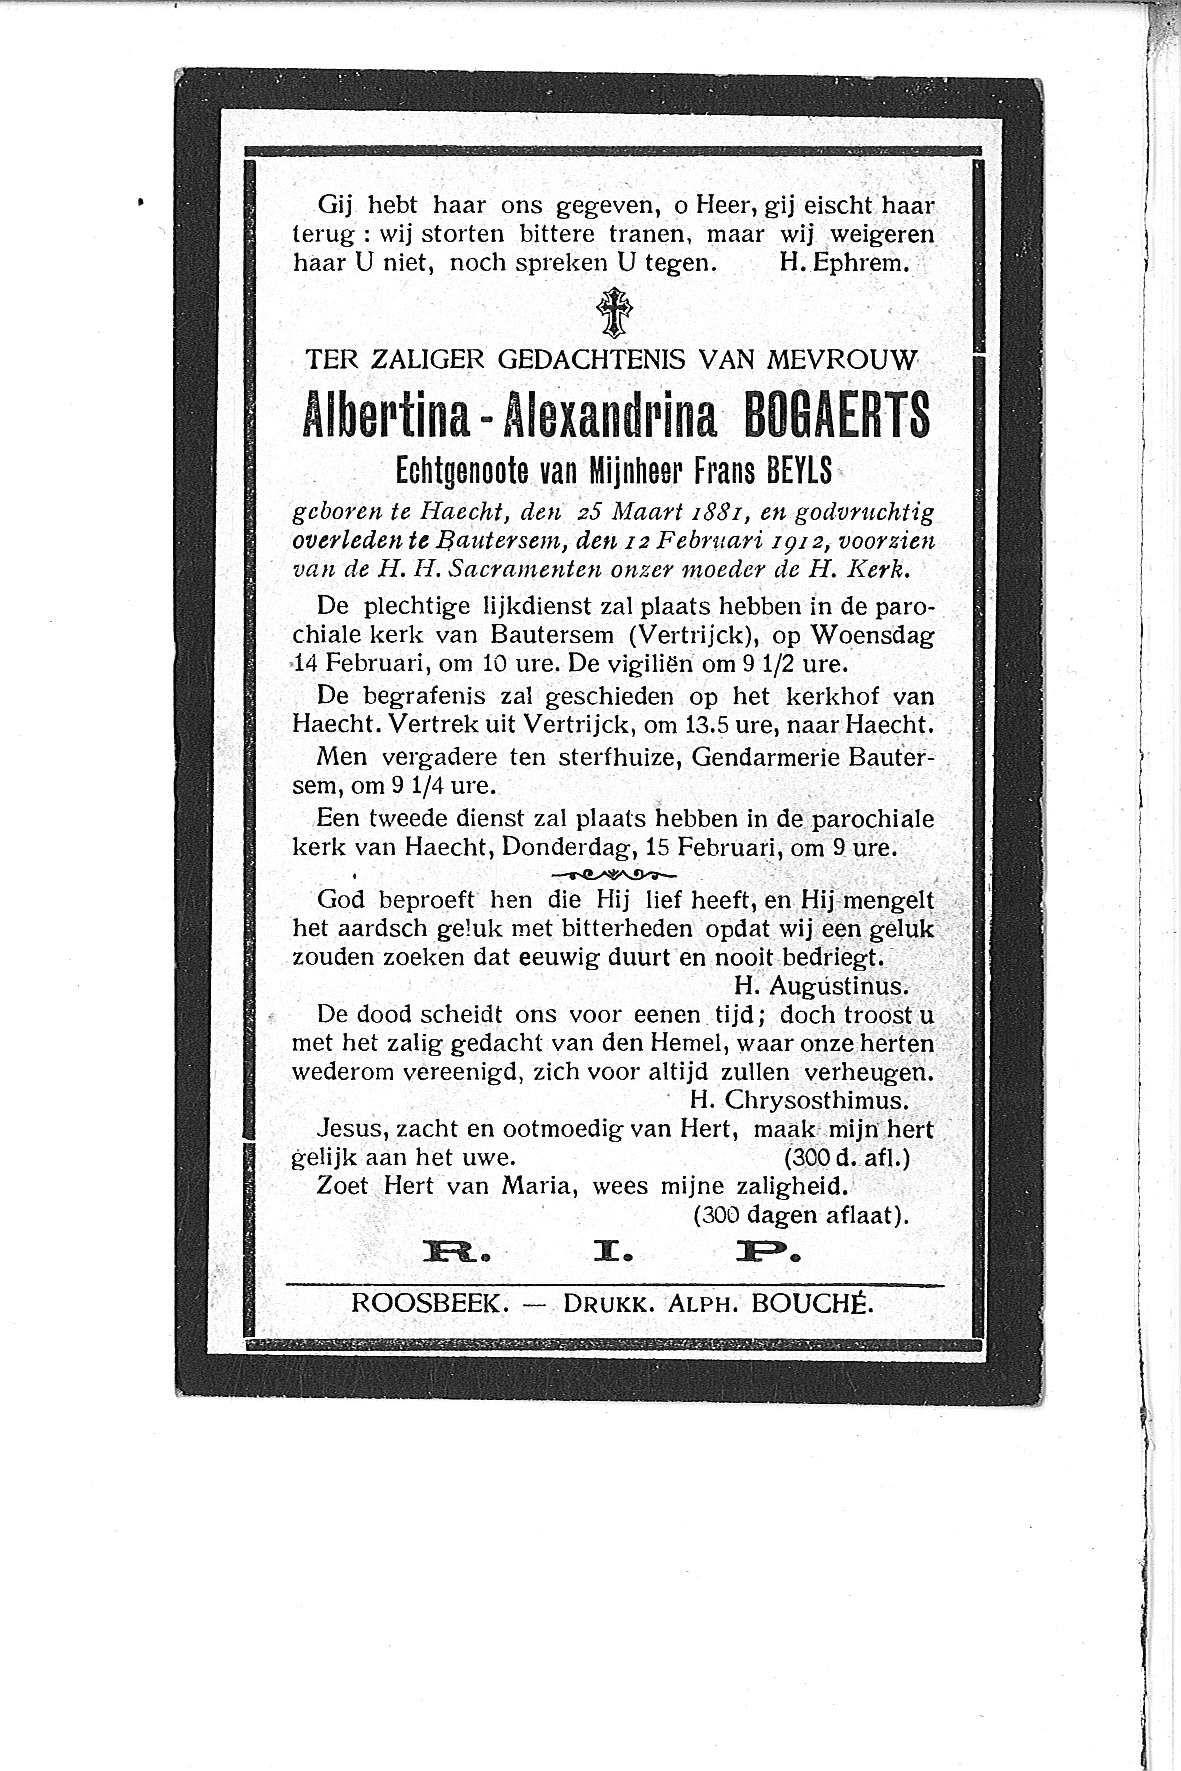 Albetina-Alexandrina(1912)20110317163116_00004.jpg